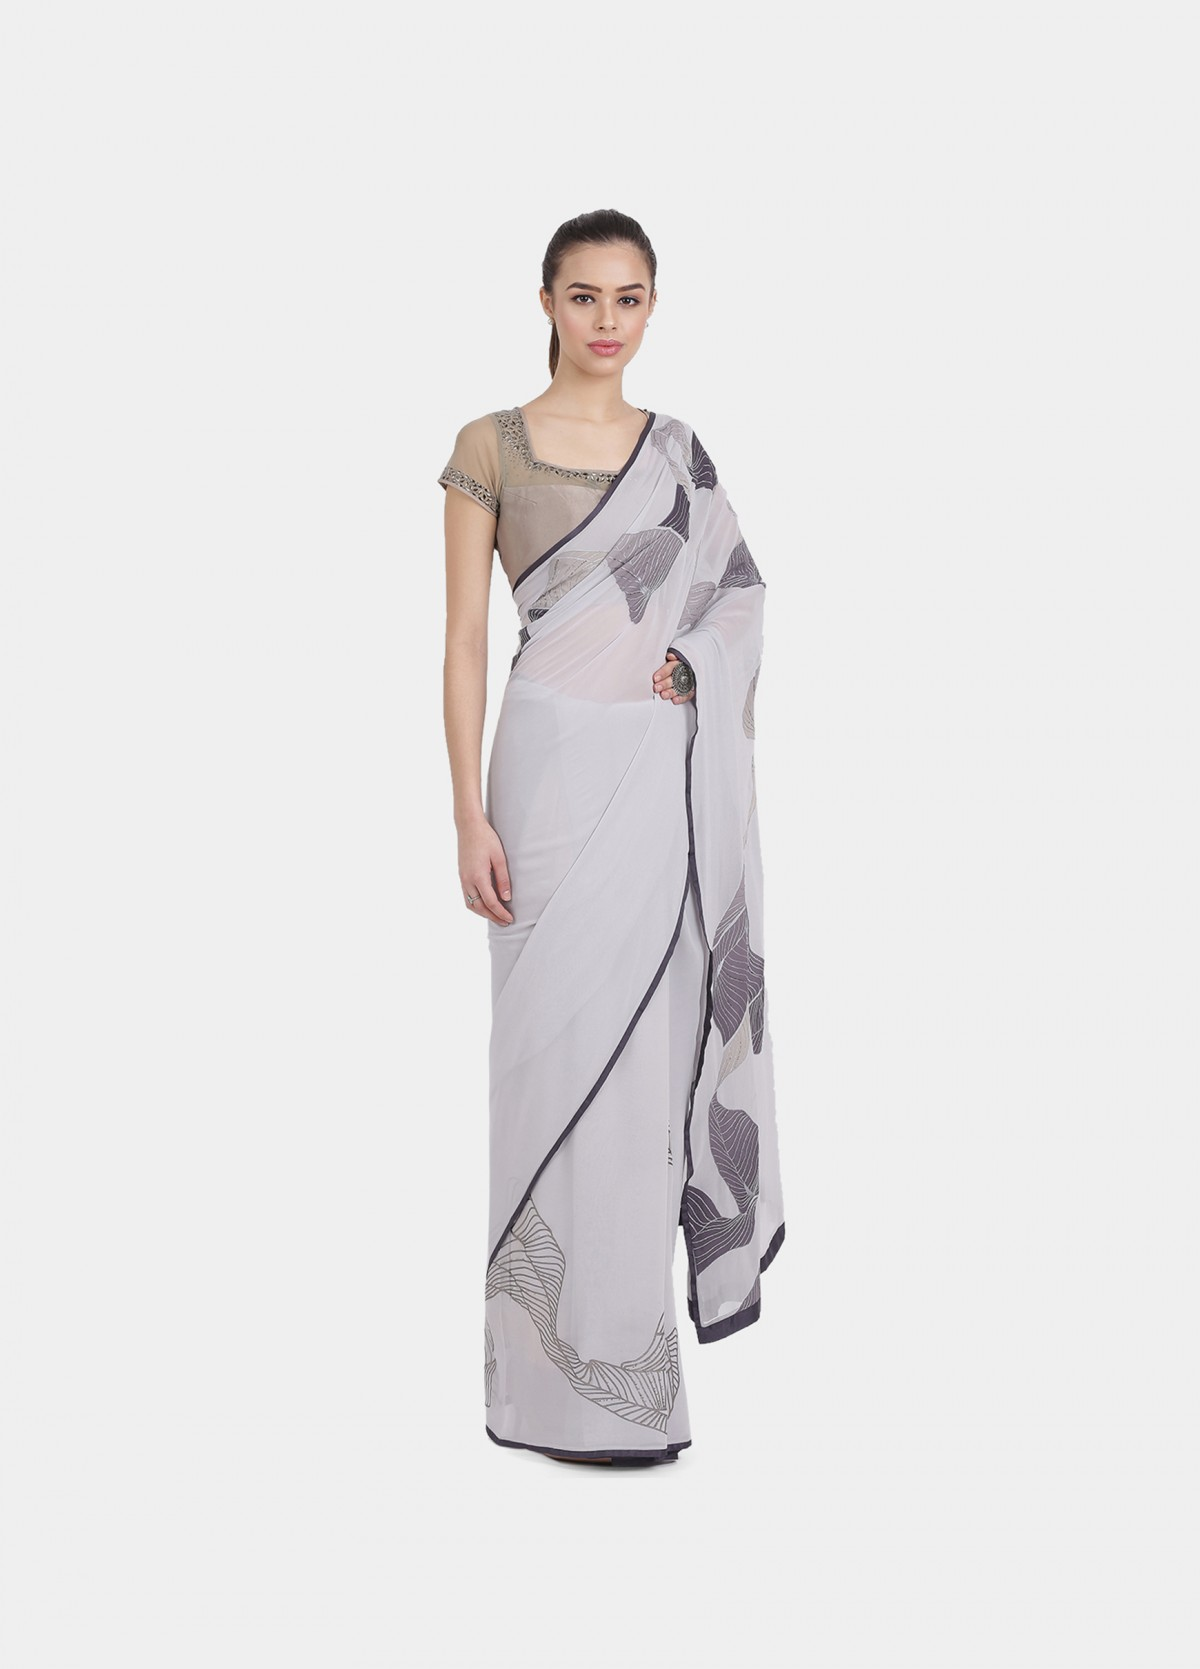 The Aftab Sari